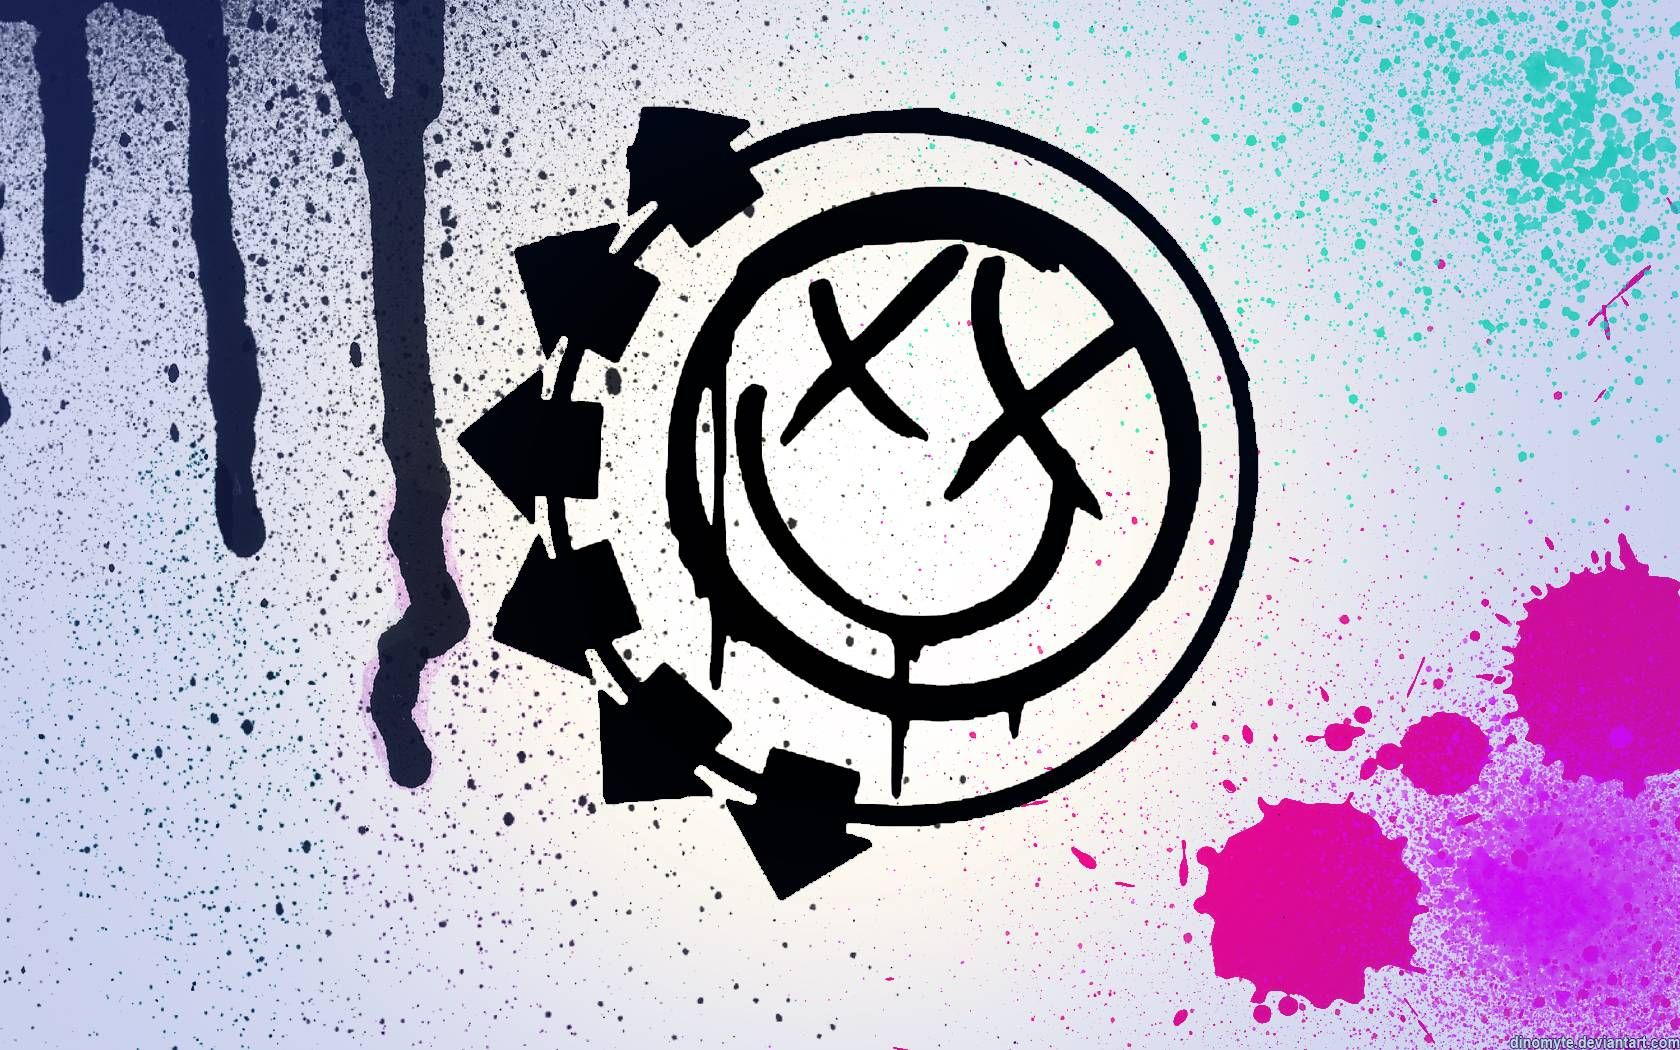 Blink 182 Backgrounds Wallpaper Cave Gambar Seni Stiker